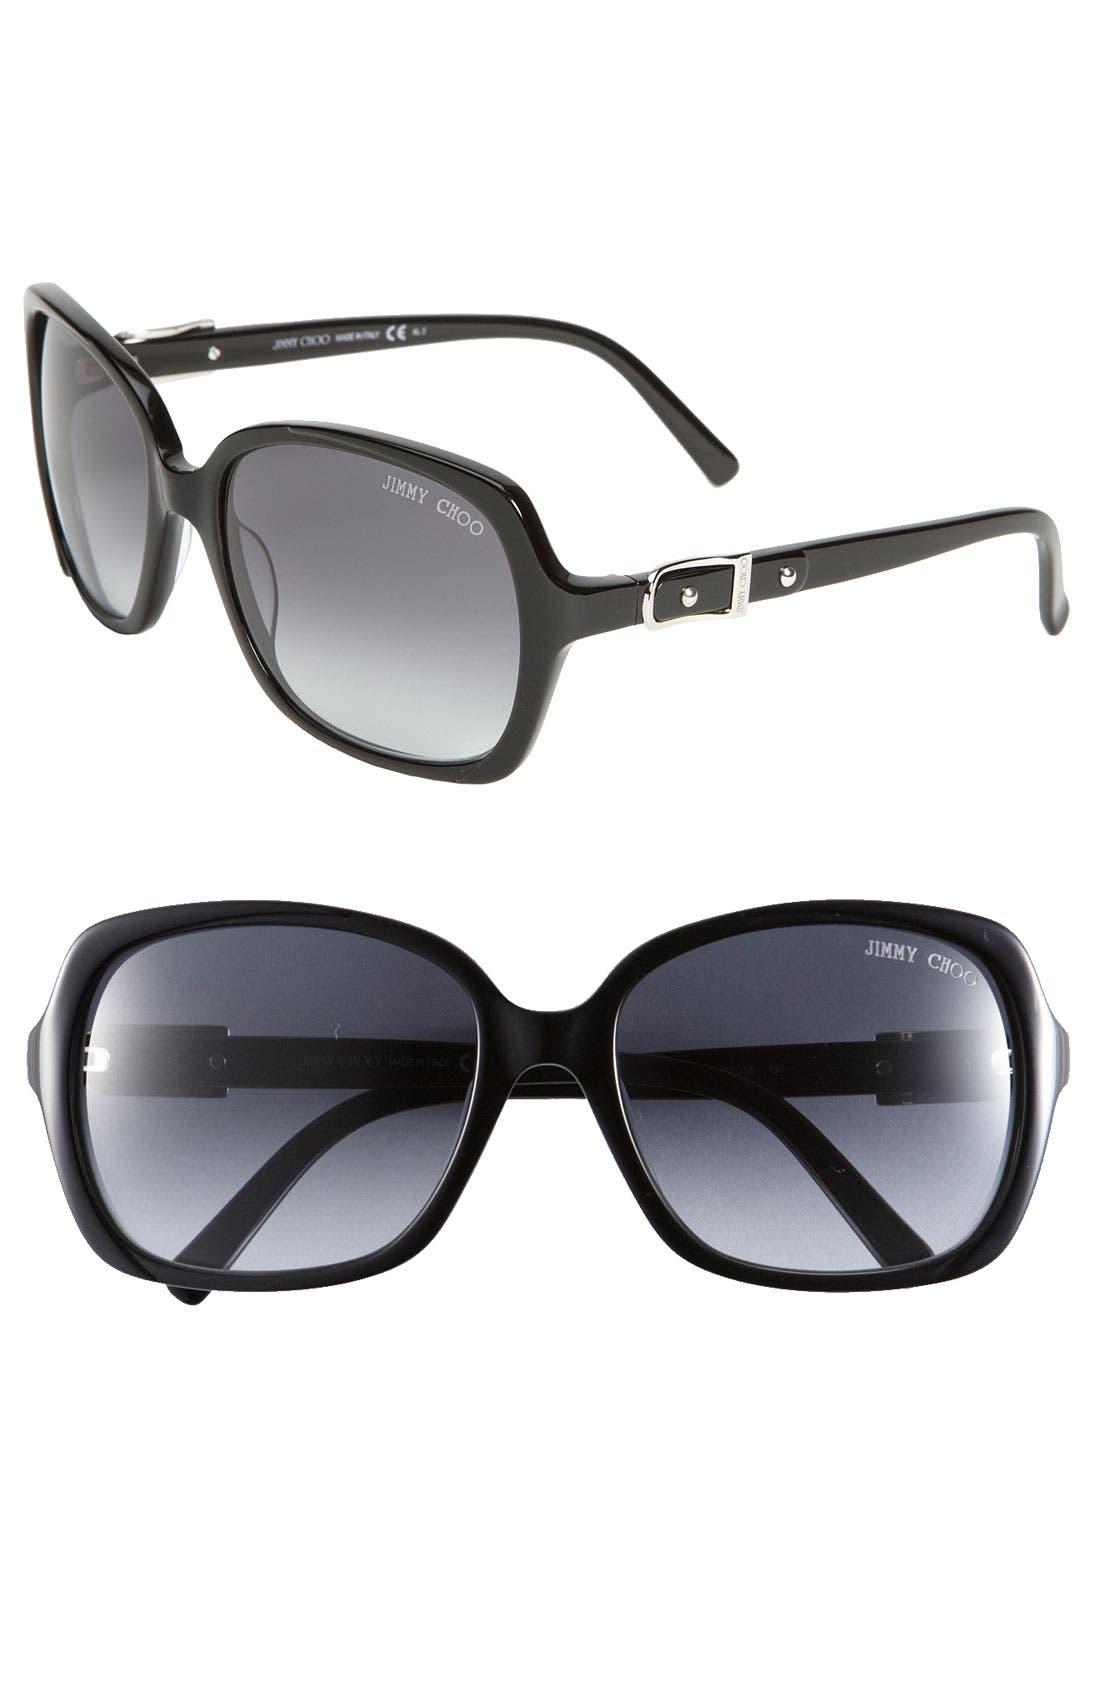 Alternate Image 1 Selected - Jimmy Choo 'Lela' Oversized Square Sunglasses